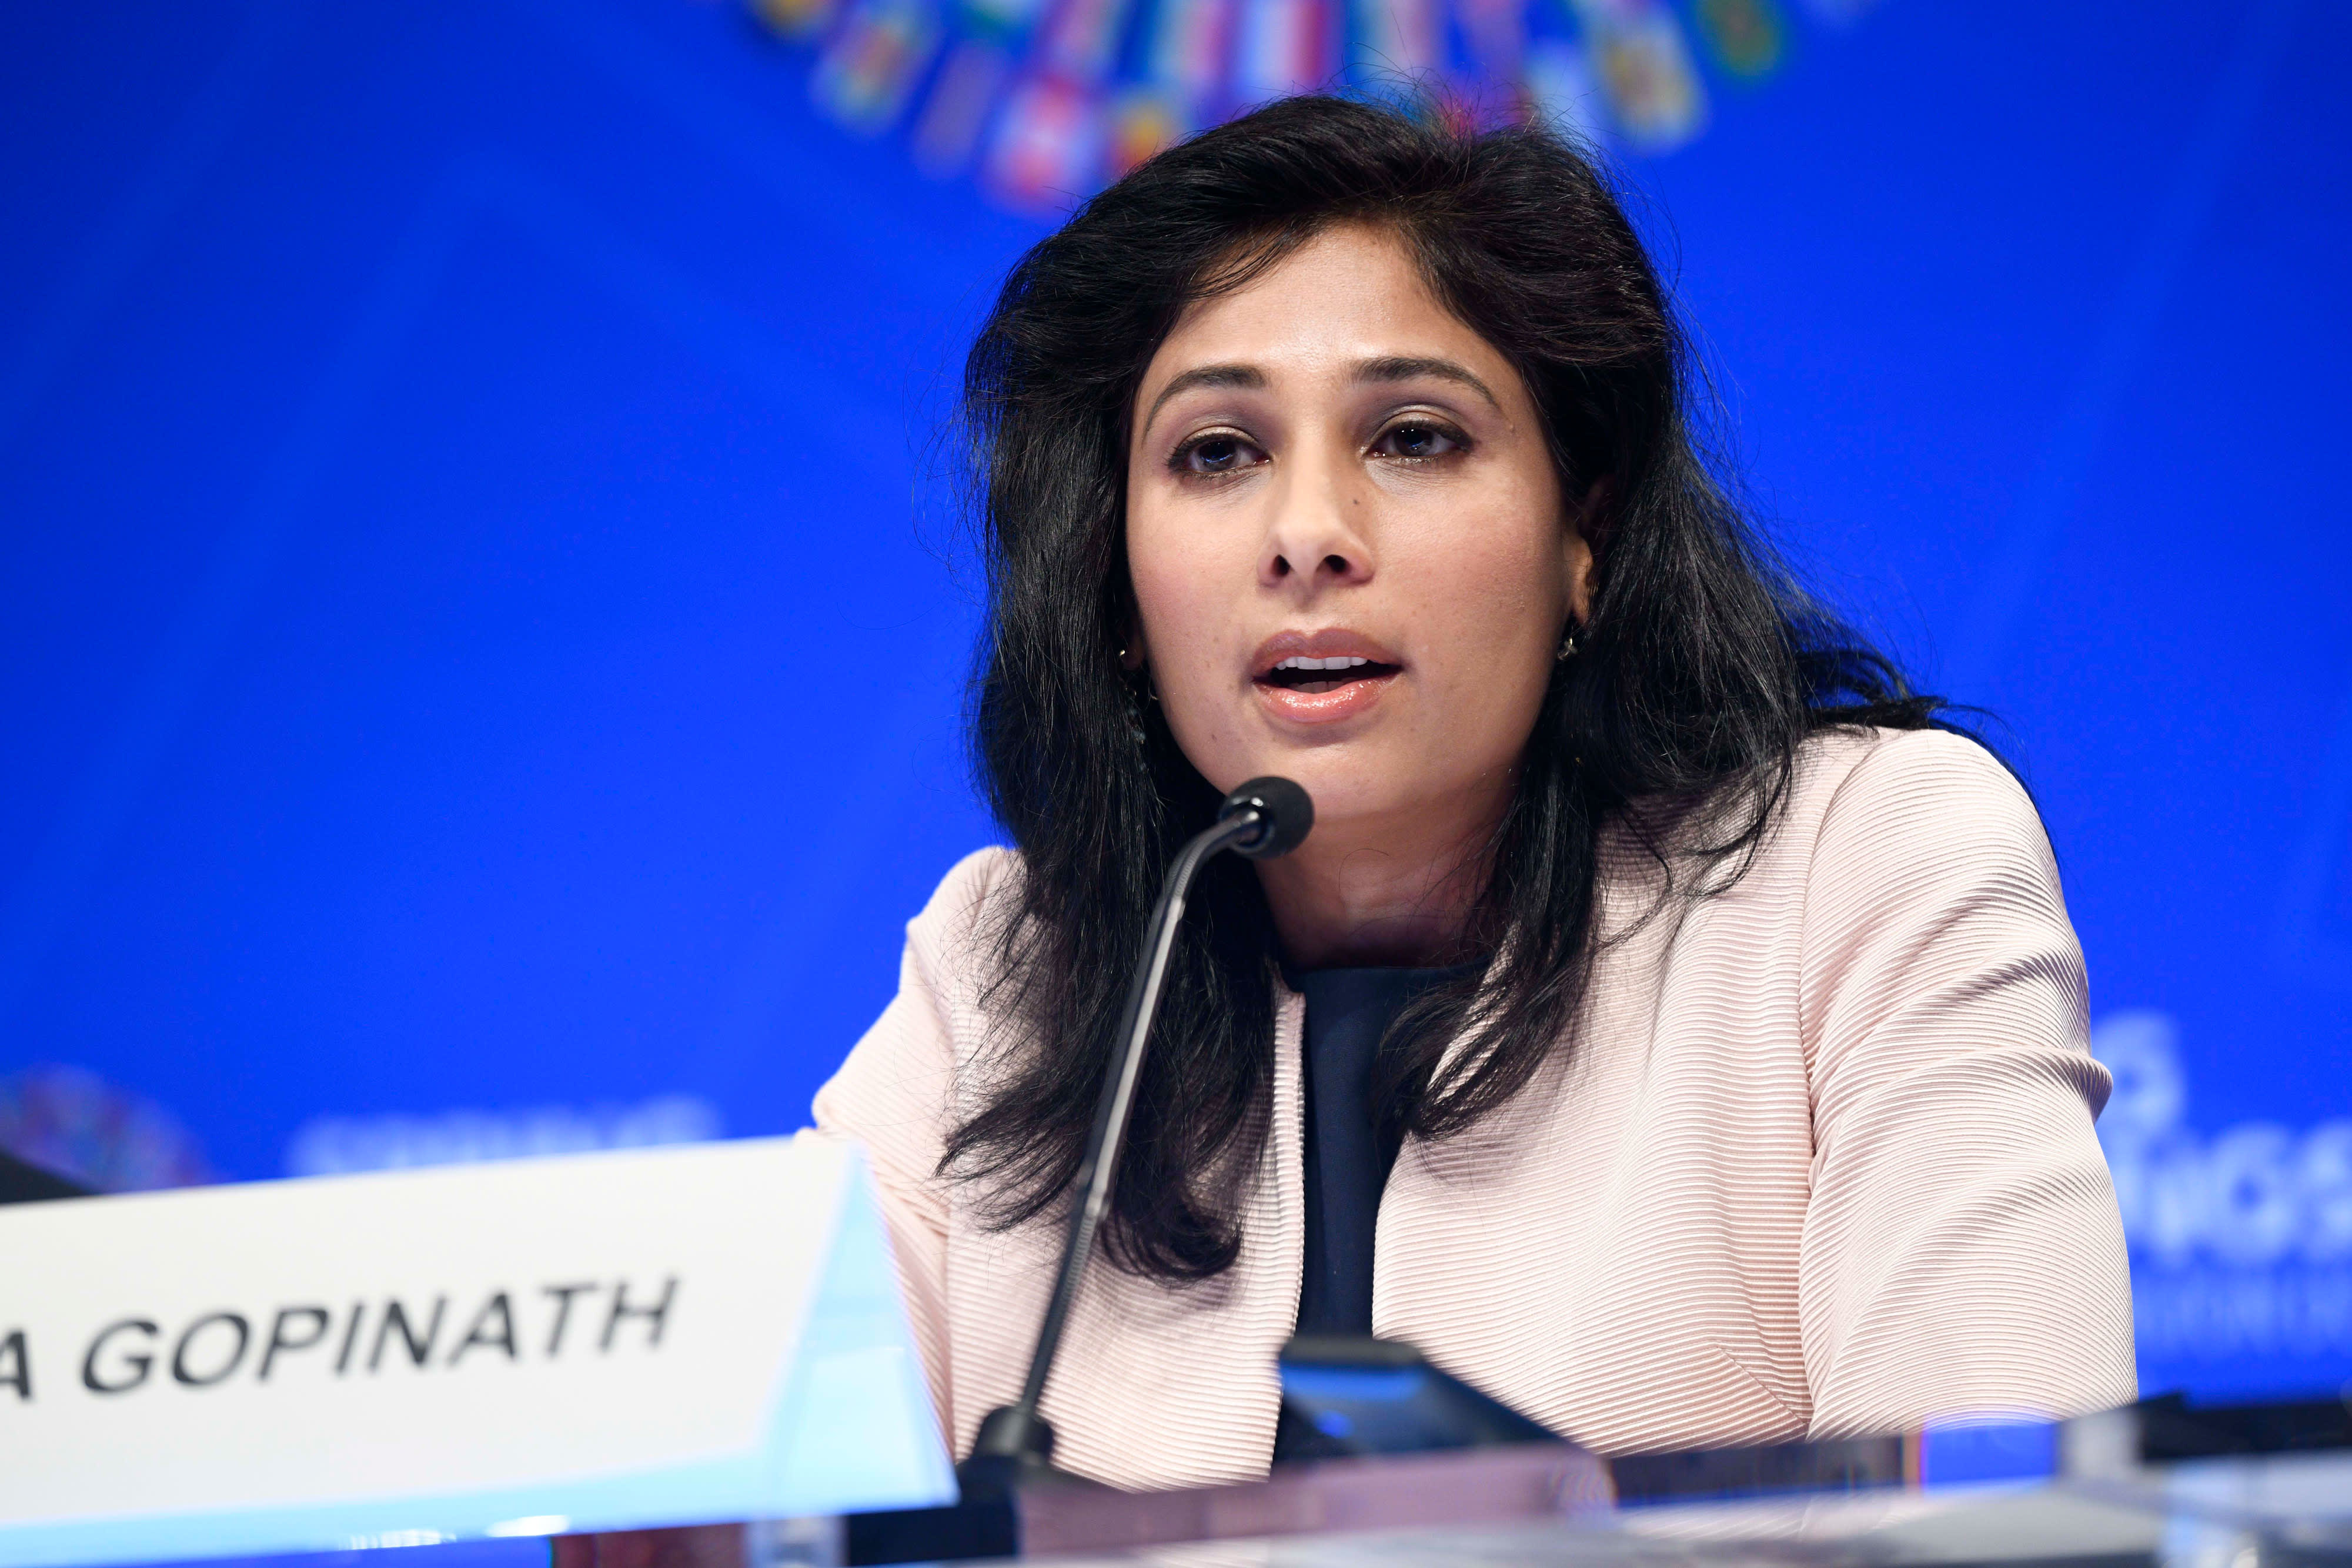 IMF chief economist Gita Gopinath: It's harder to find bright spots in  global economy